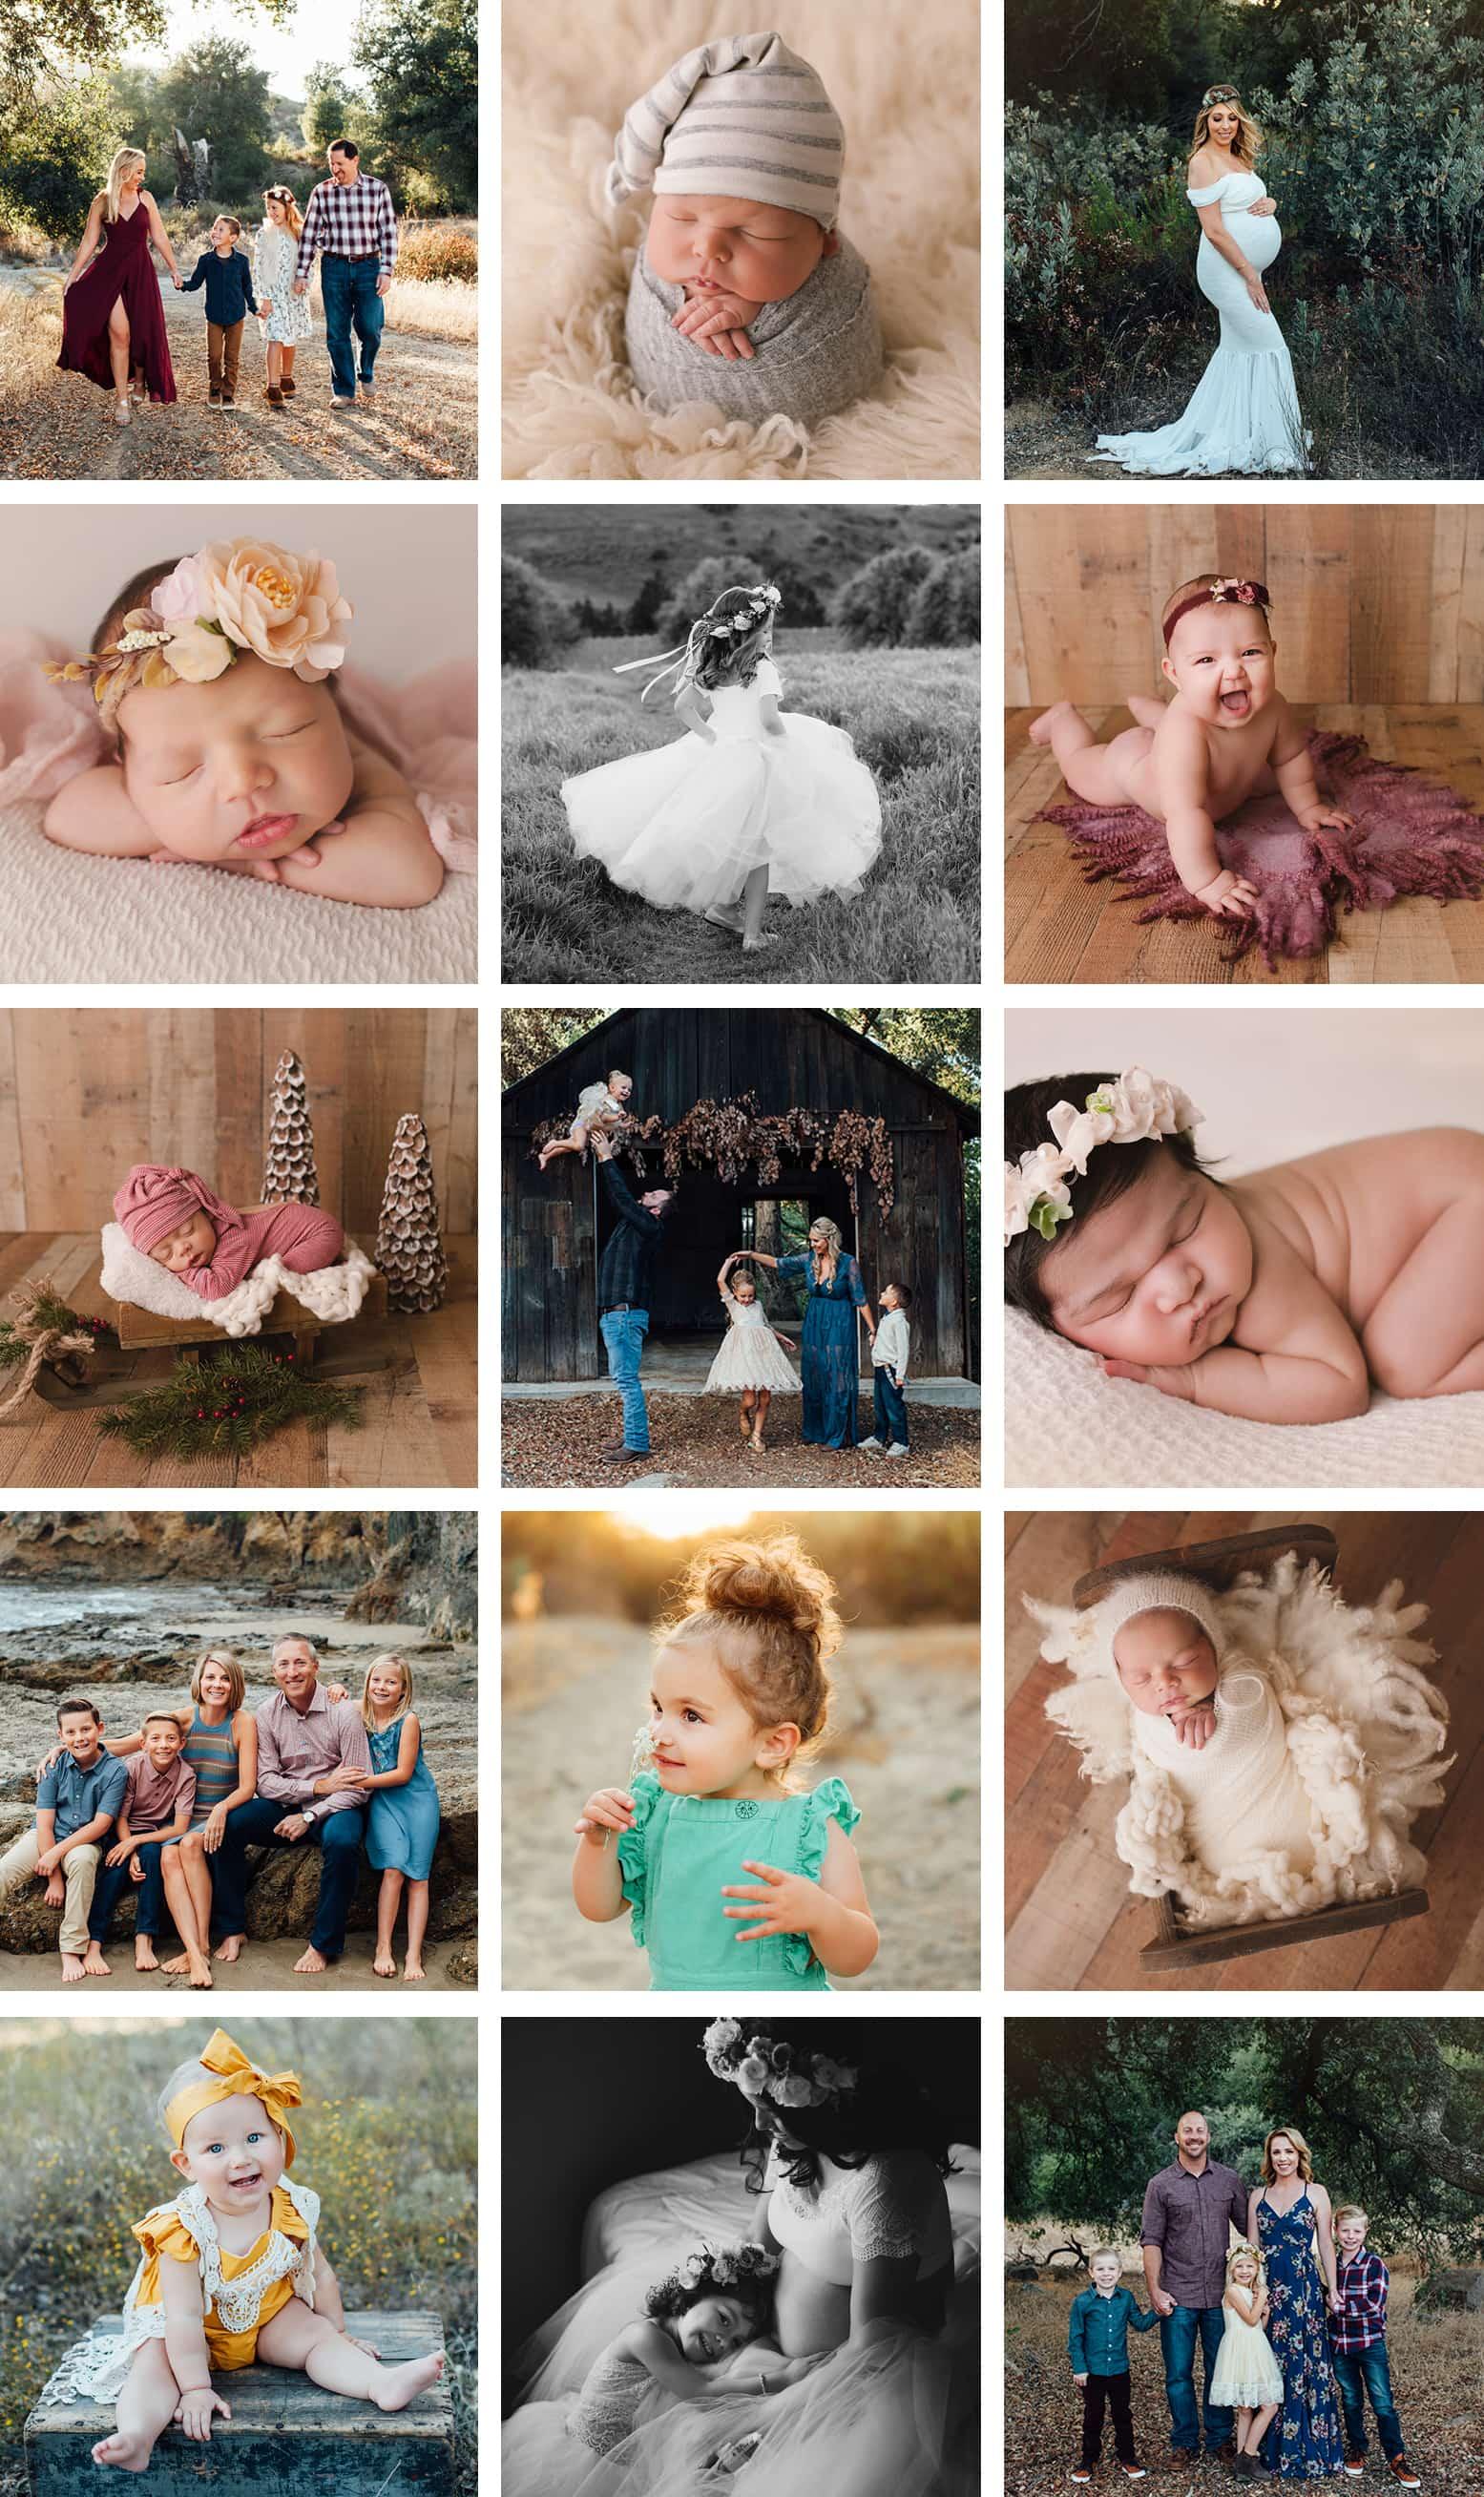 Temecula newborn photographer, Temecula child photographer, Temecula maternity photographer, Temecula family photographer